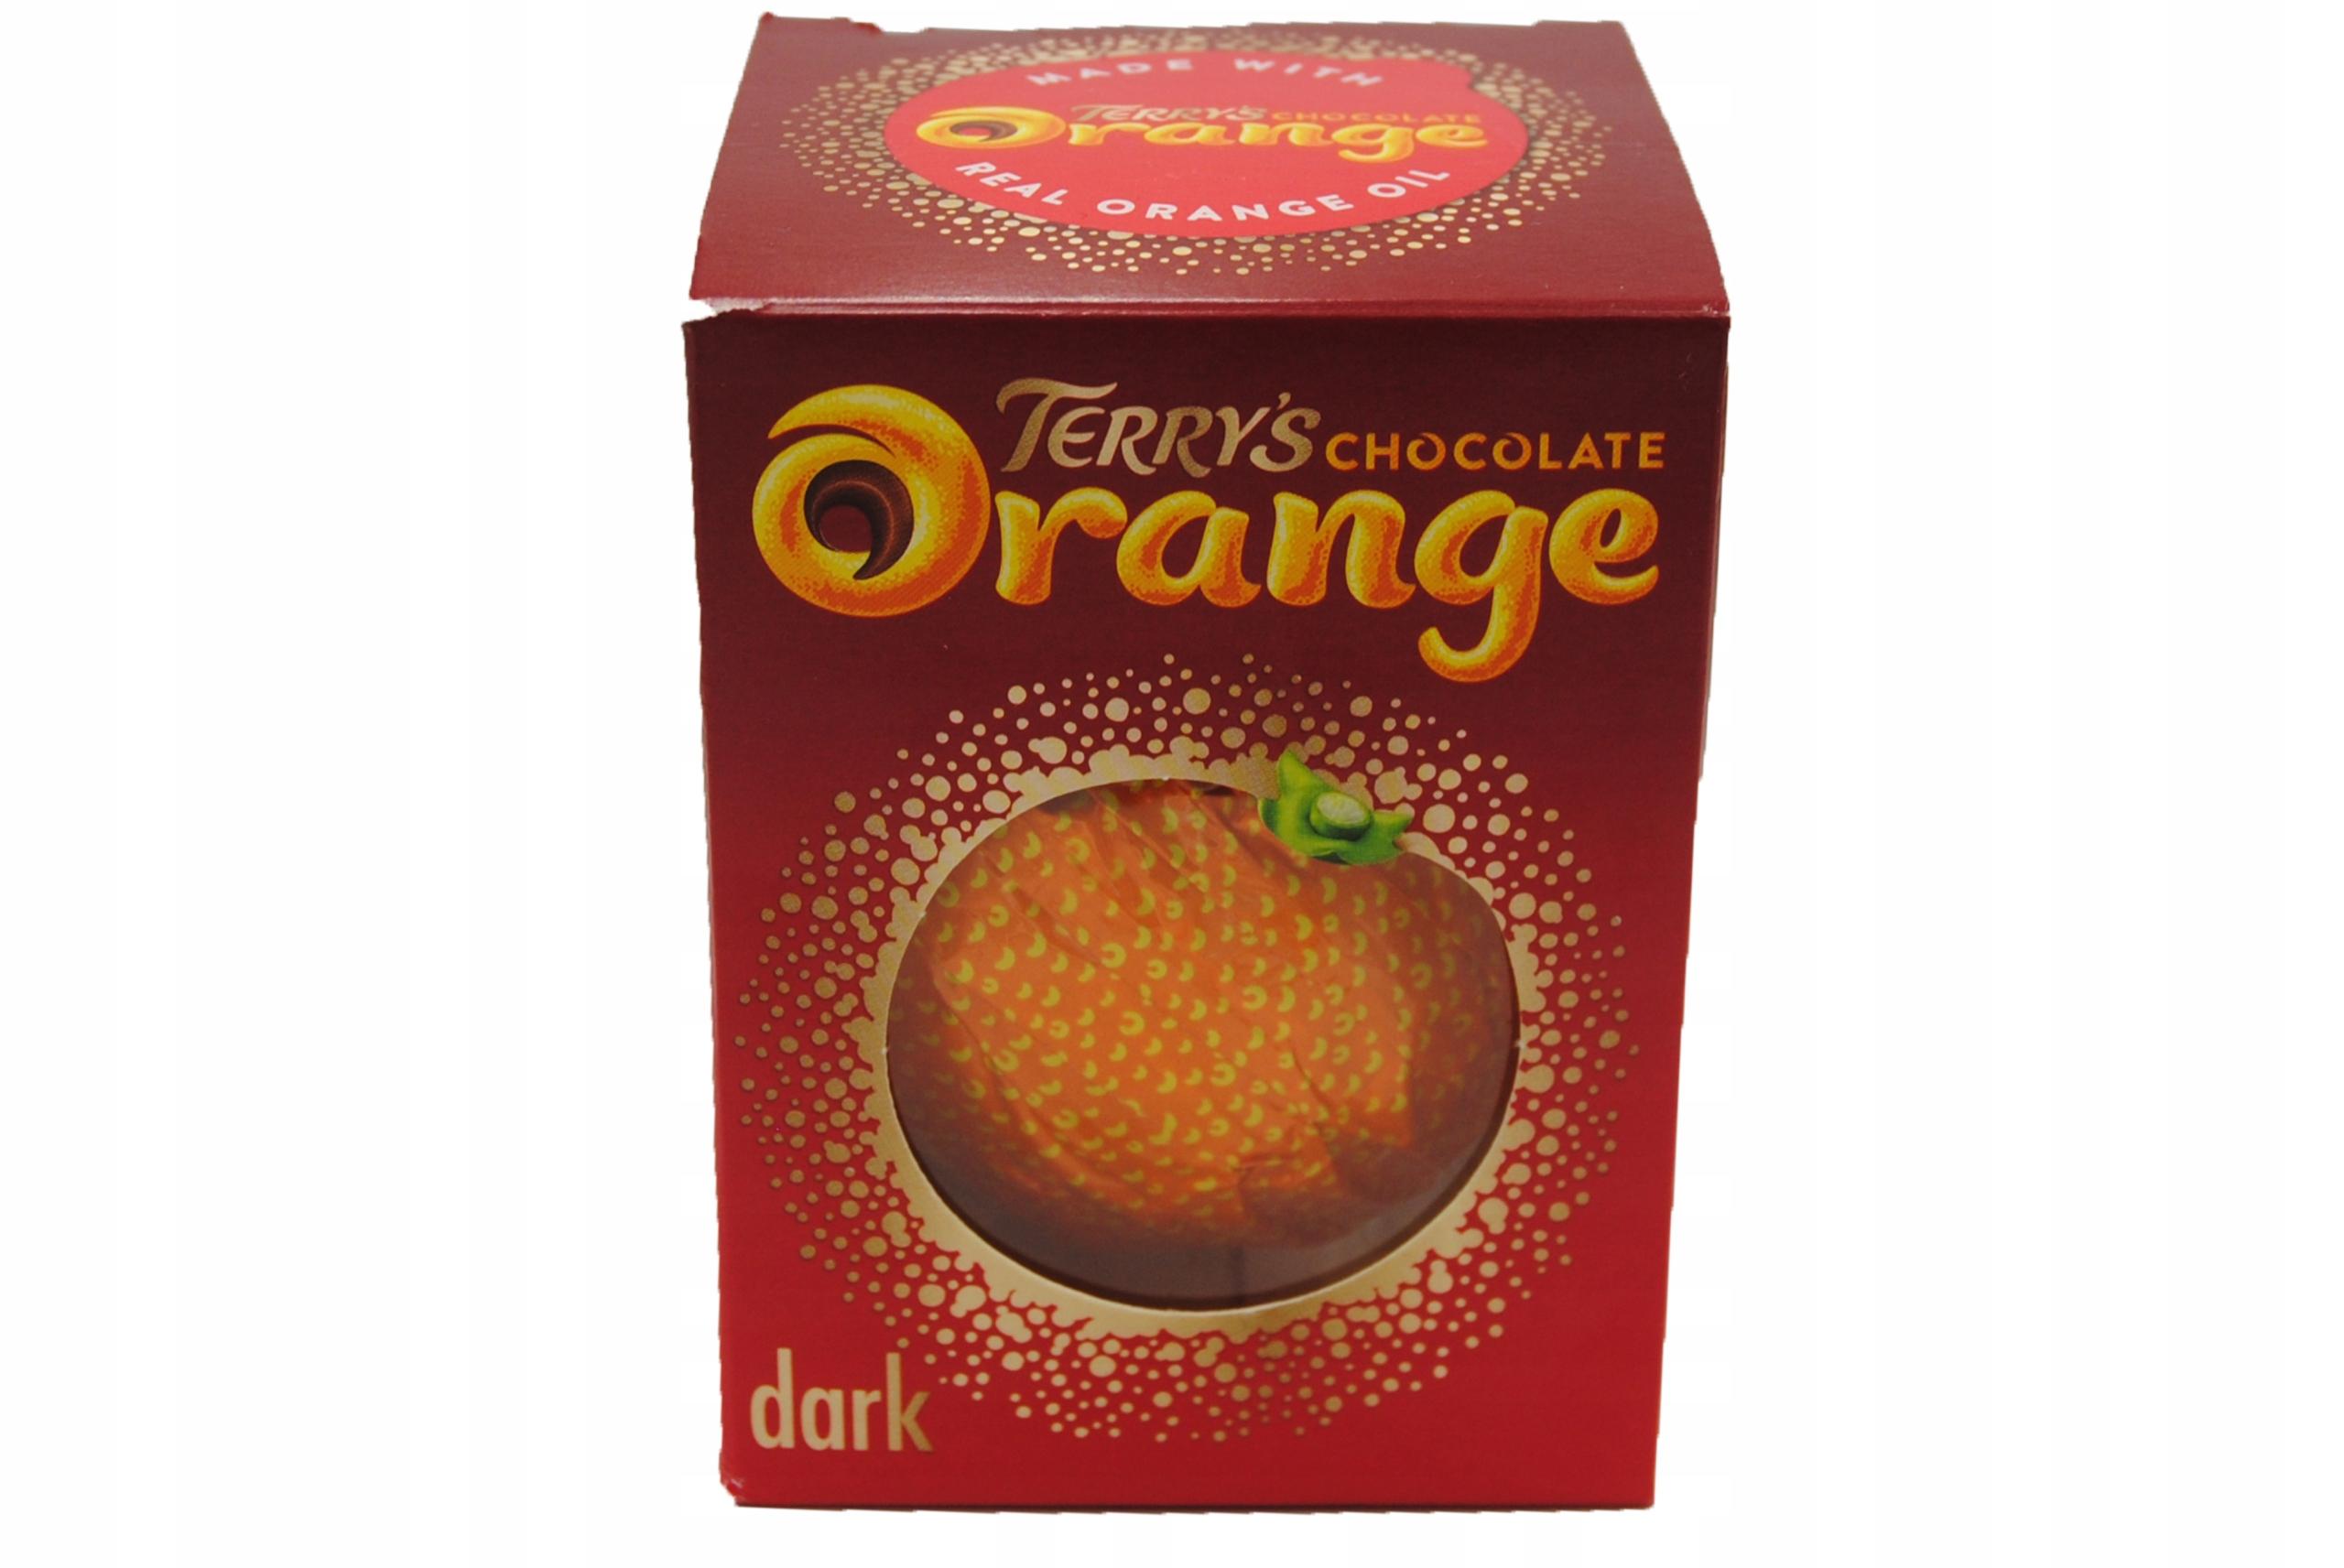 4x шоколадные шарики Terry's Orange с десертом 175 г